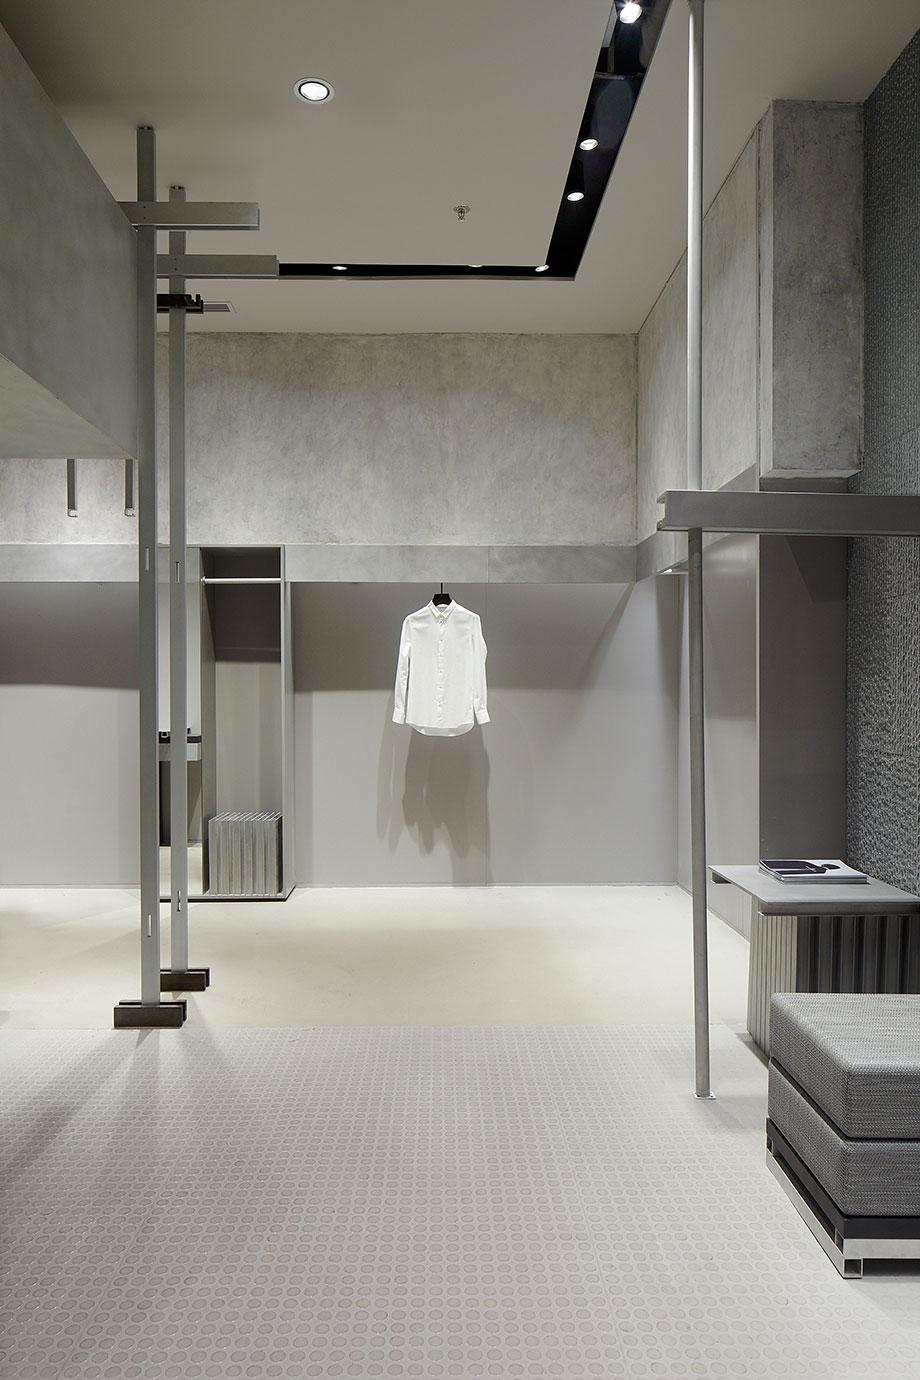 samo store de so studio (3) - foto yuhao ding